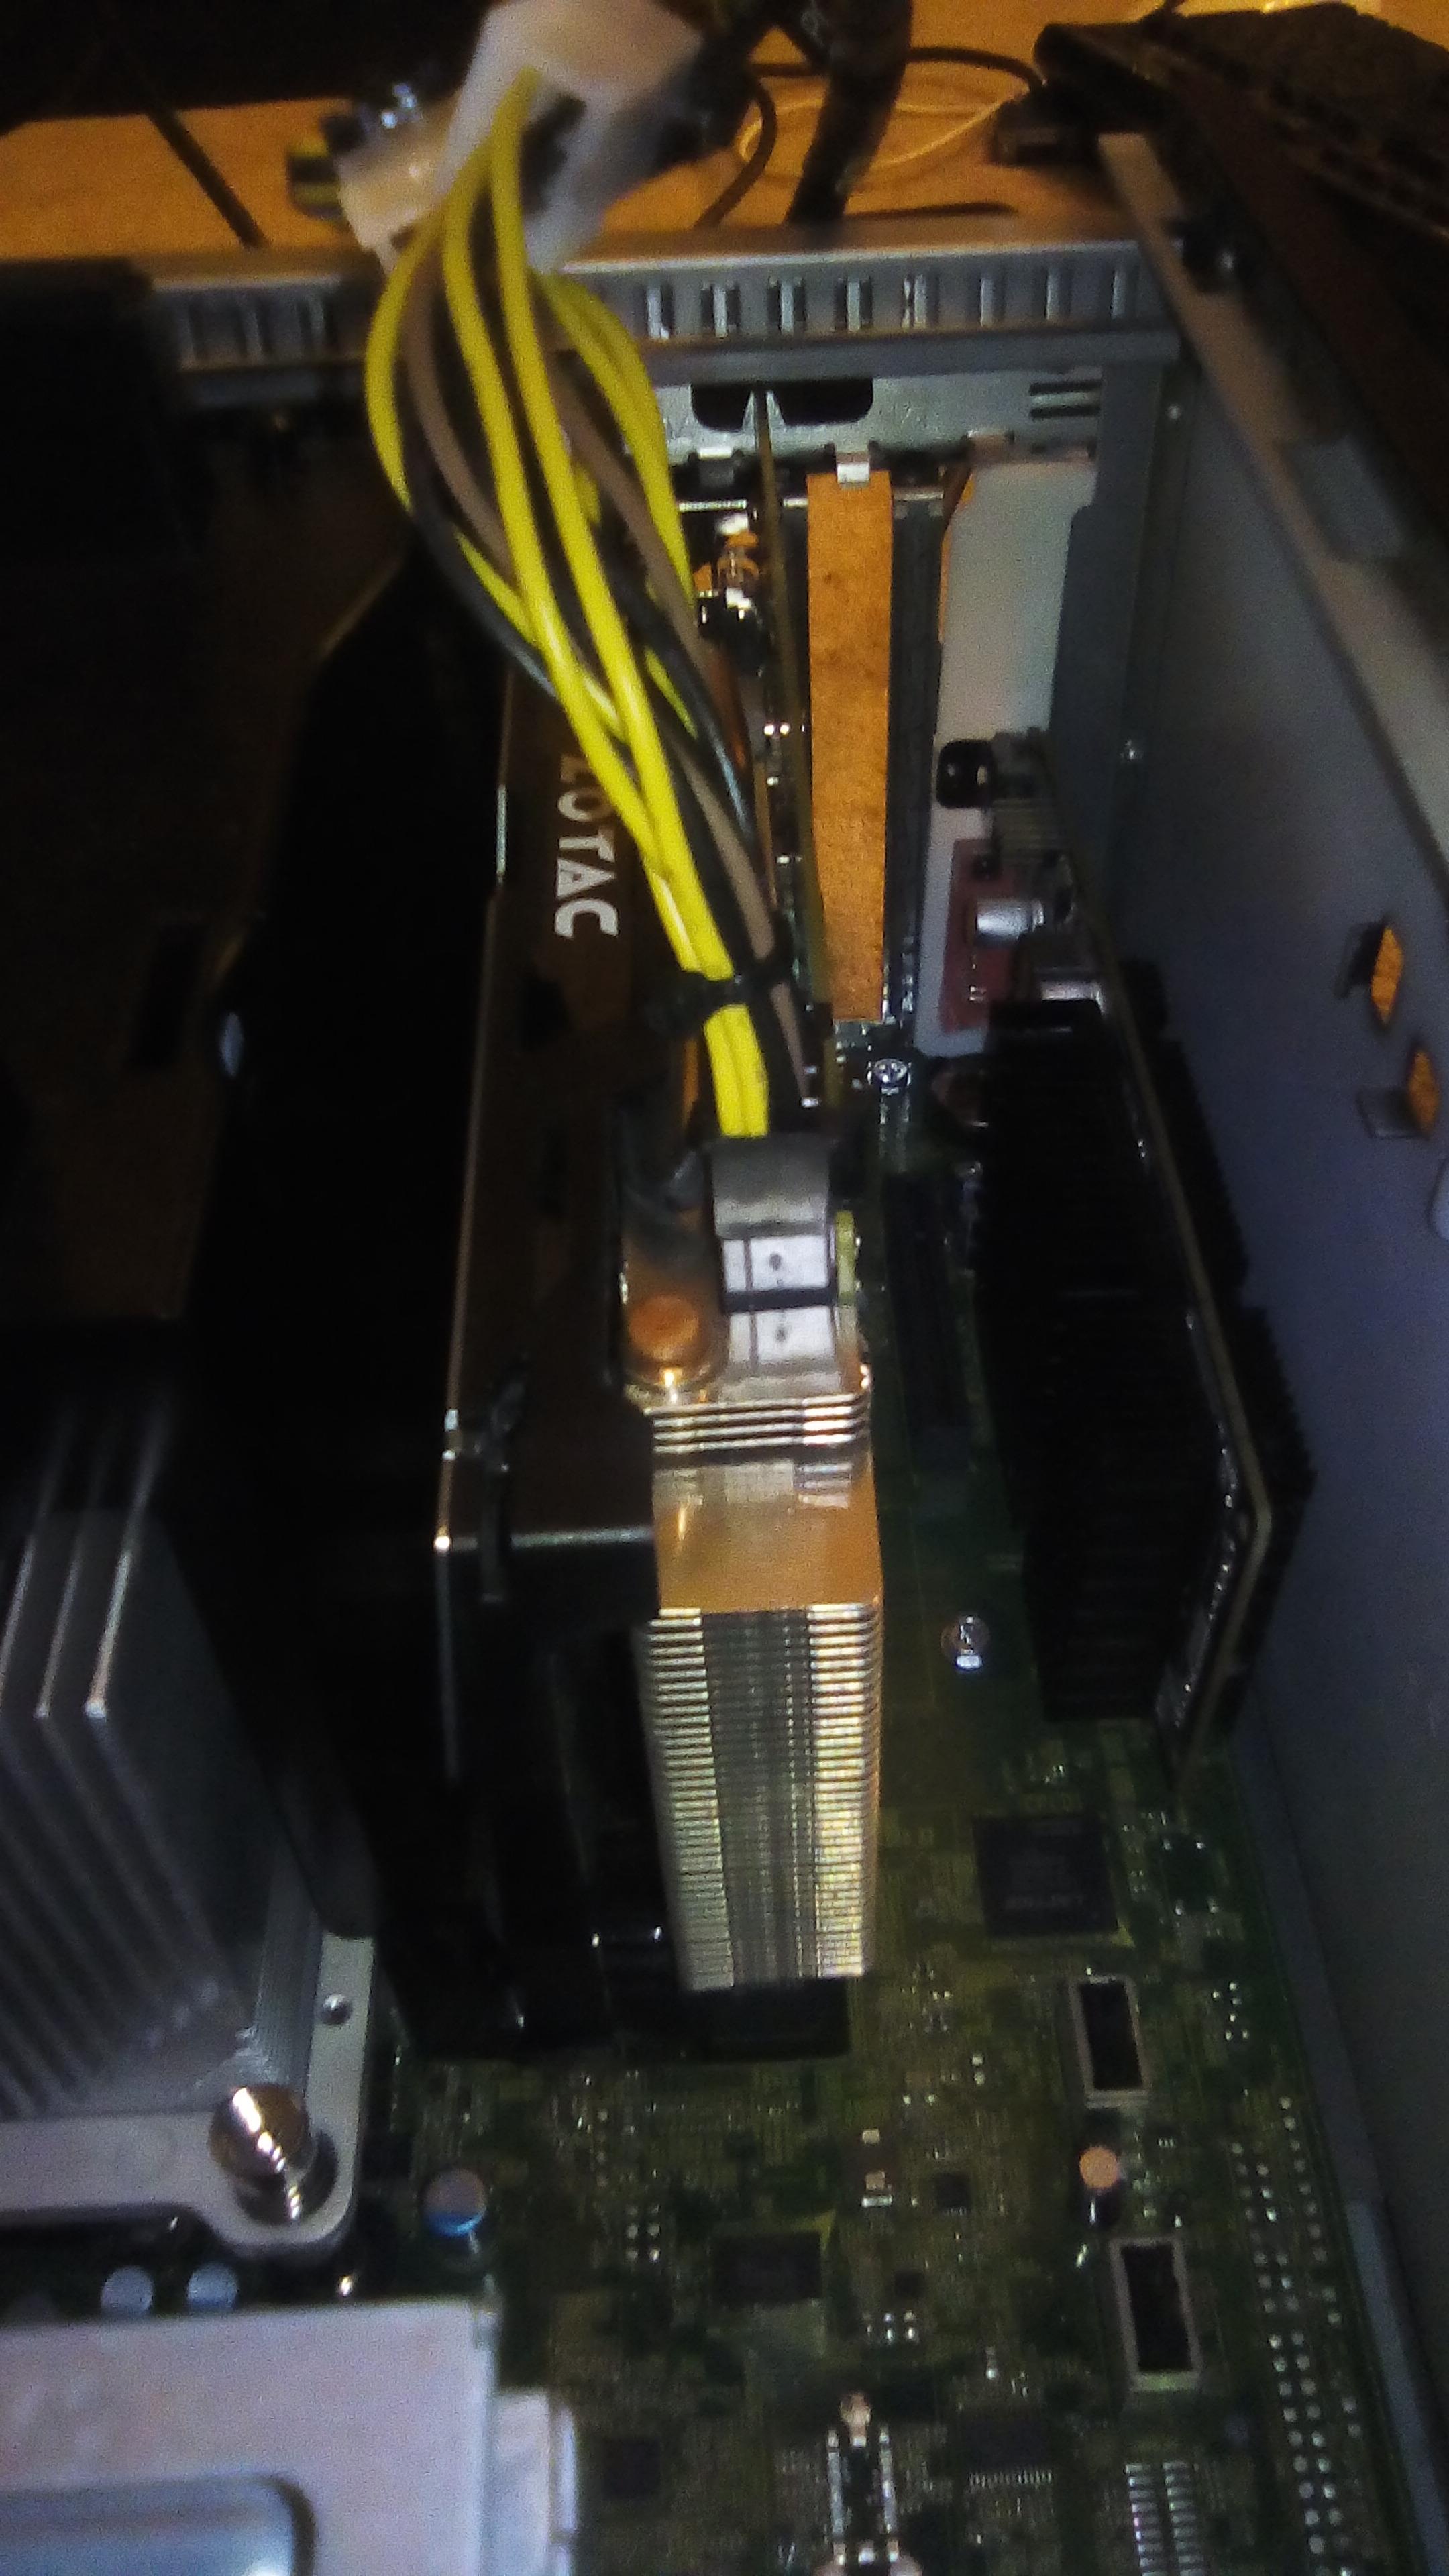 Dell PowerEdge T110 ii GPU solution found - Build a PC